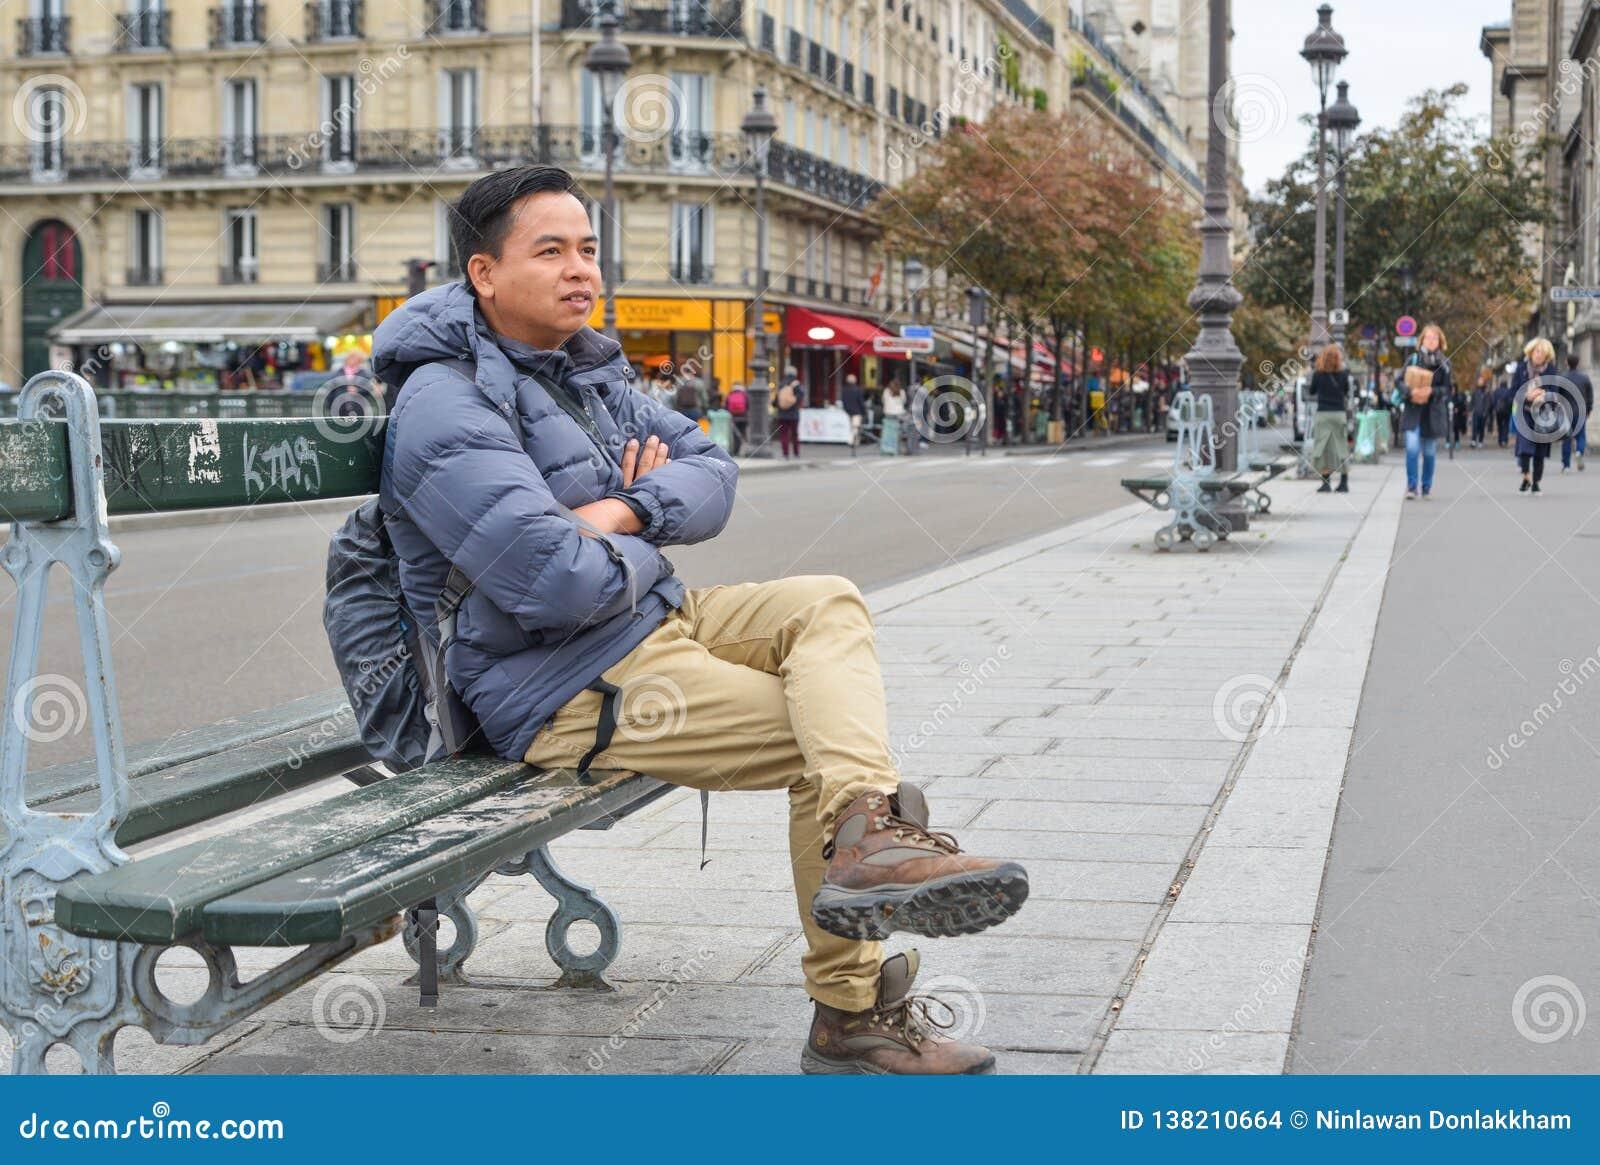 A man sitting on vintage bench